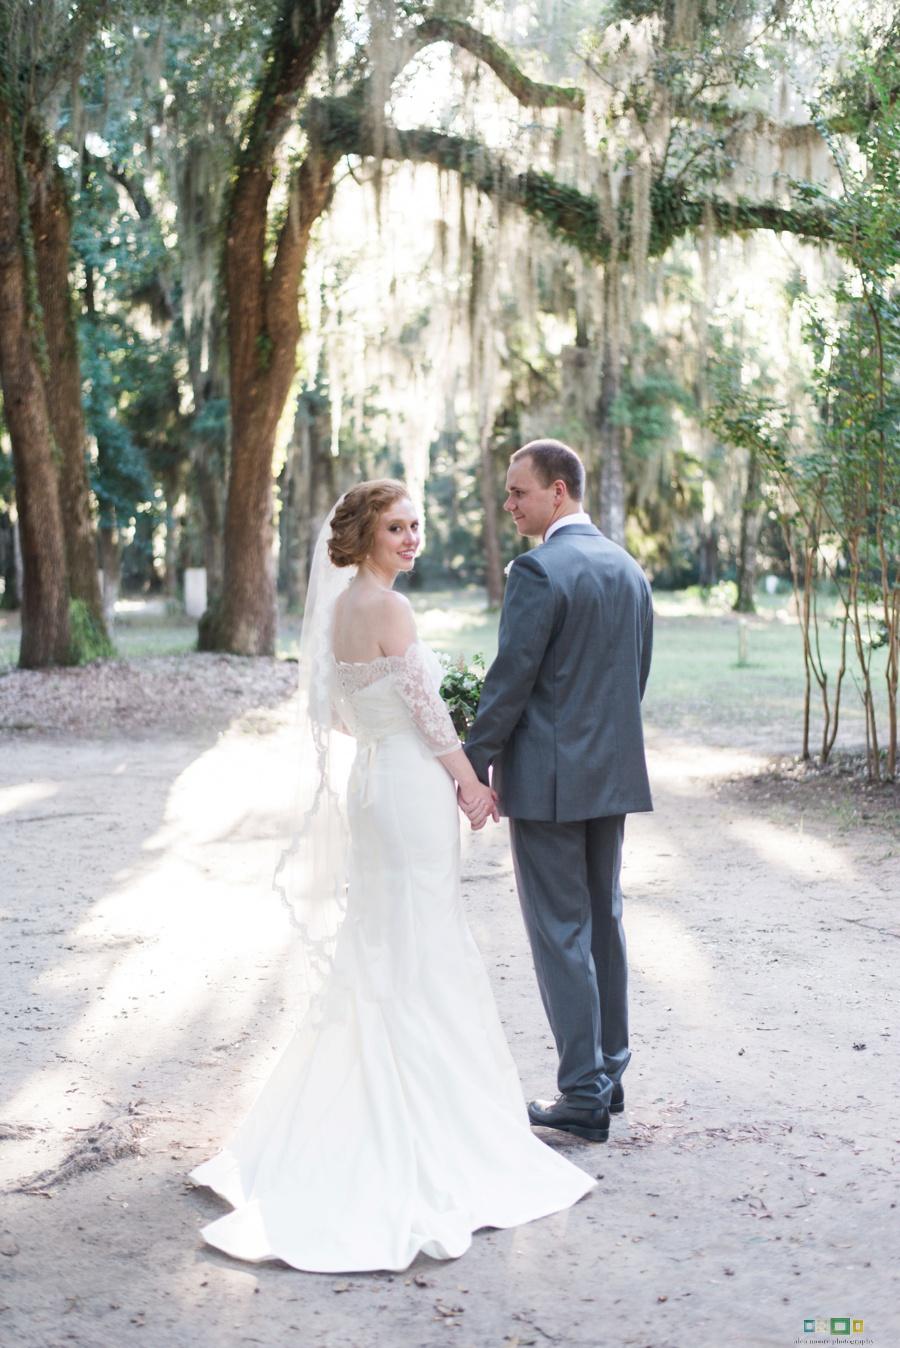 alea-moore-photography-Daufuskie-Island-wedding-ivory-and-beau-bridal-boutique-dakota-nicole-miller-rebecca-schoneveld-marisol-classic-southern-wedding-savannah-wedding-dresses-savannah-bridal-boutique-savannah-weddings-savannah-bridal-gowns-5.jpg